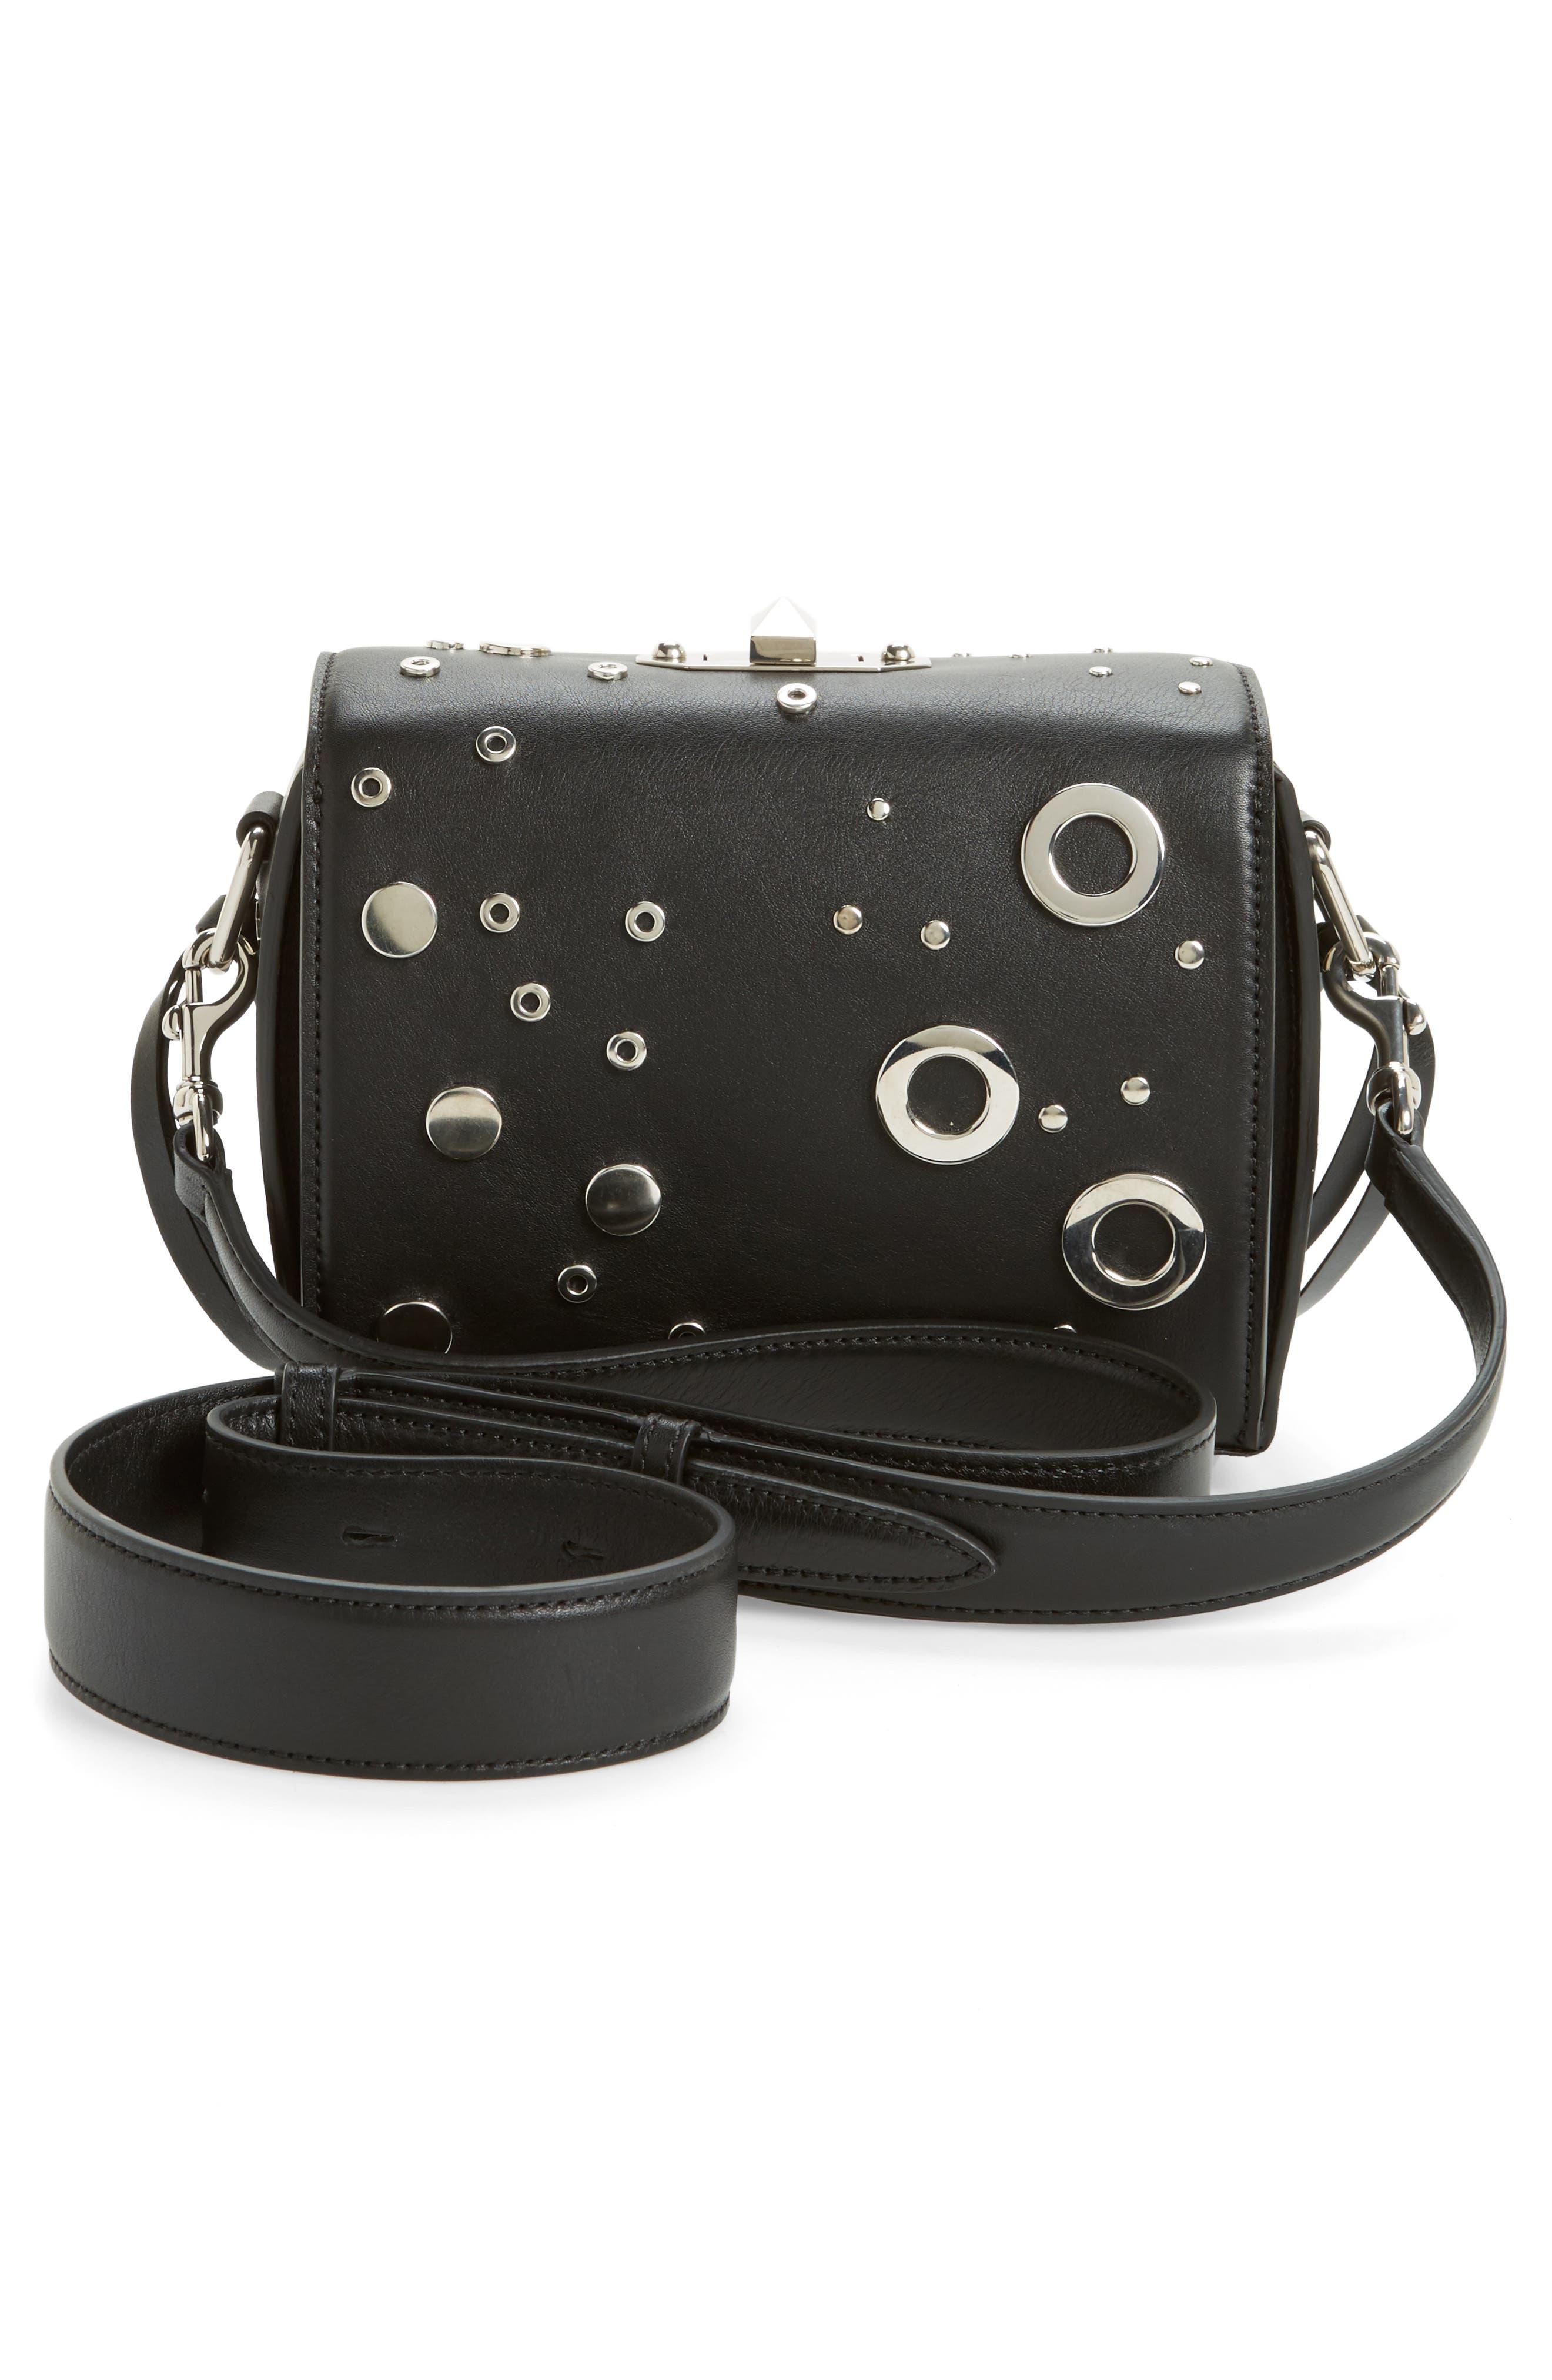 Grommet & Stud Calfskin Leather Box Bag,                             Alternate thumbnail 3, color,                             001